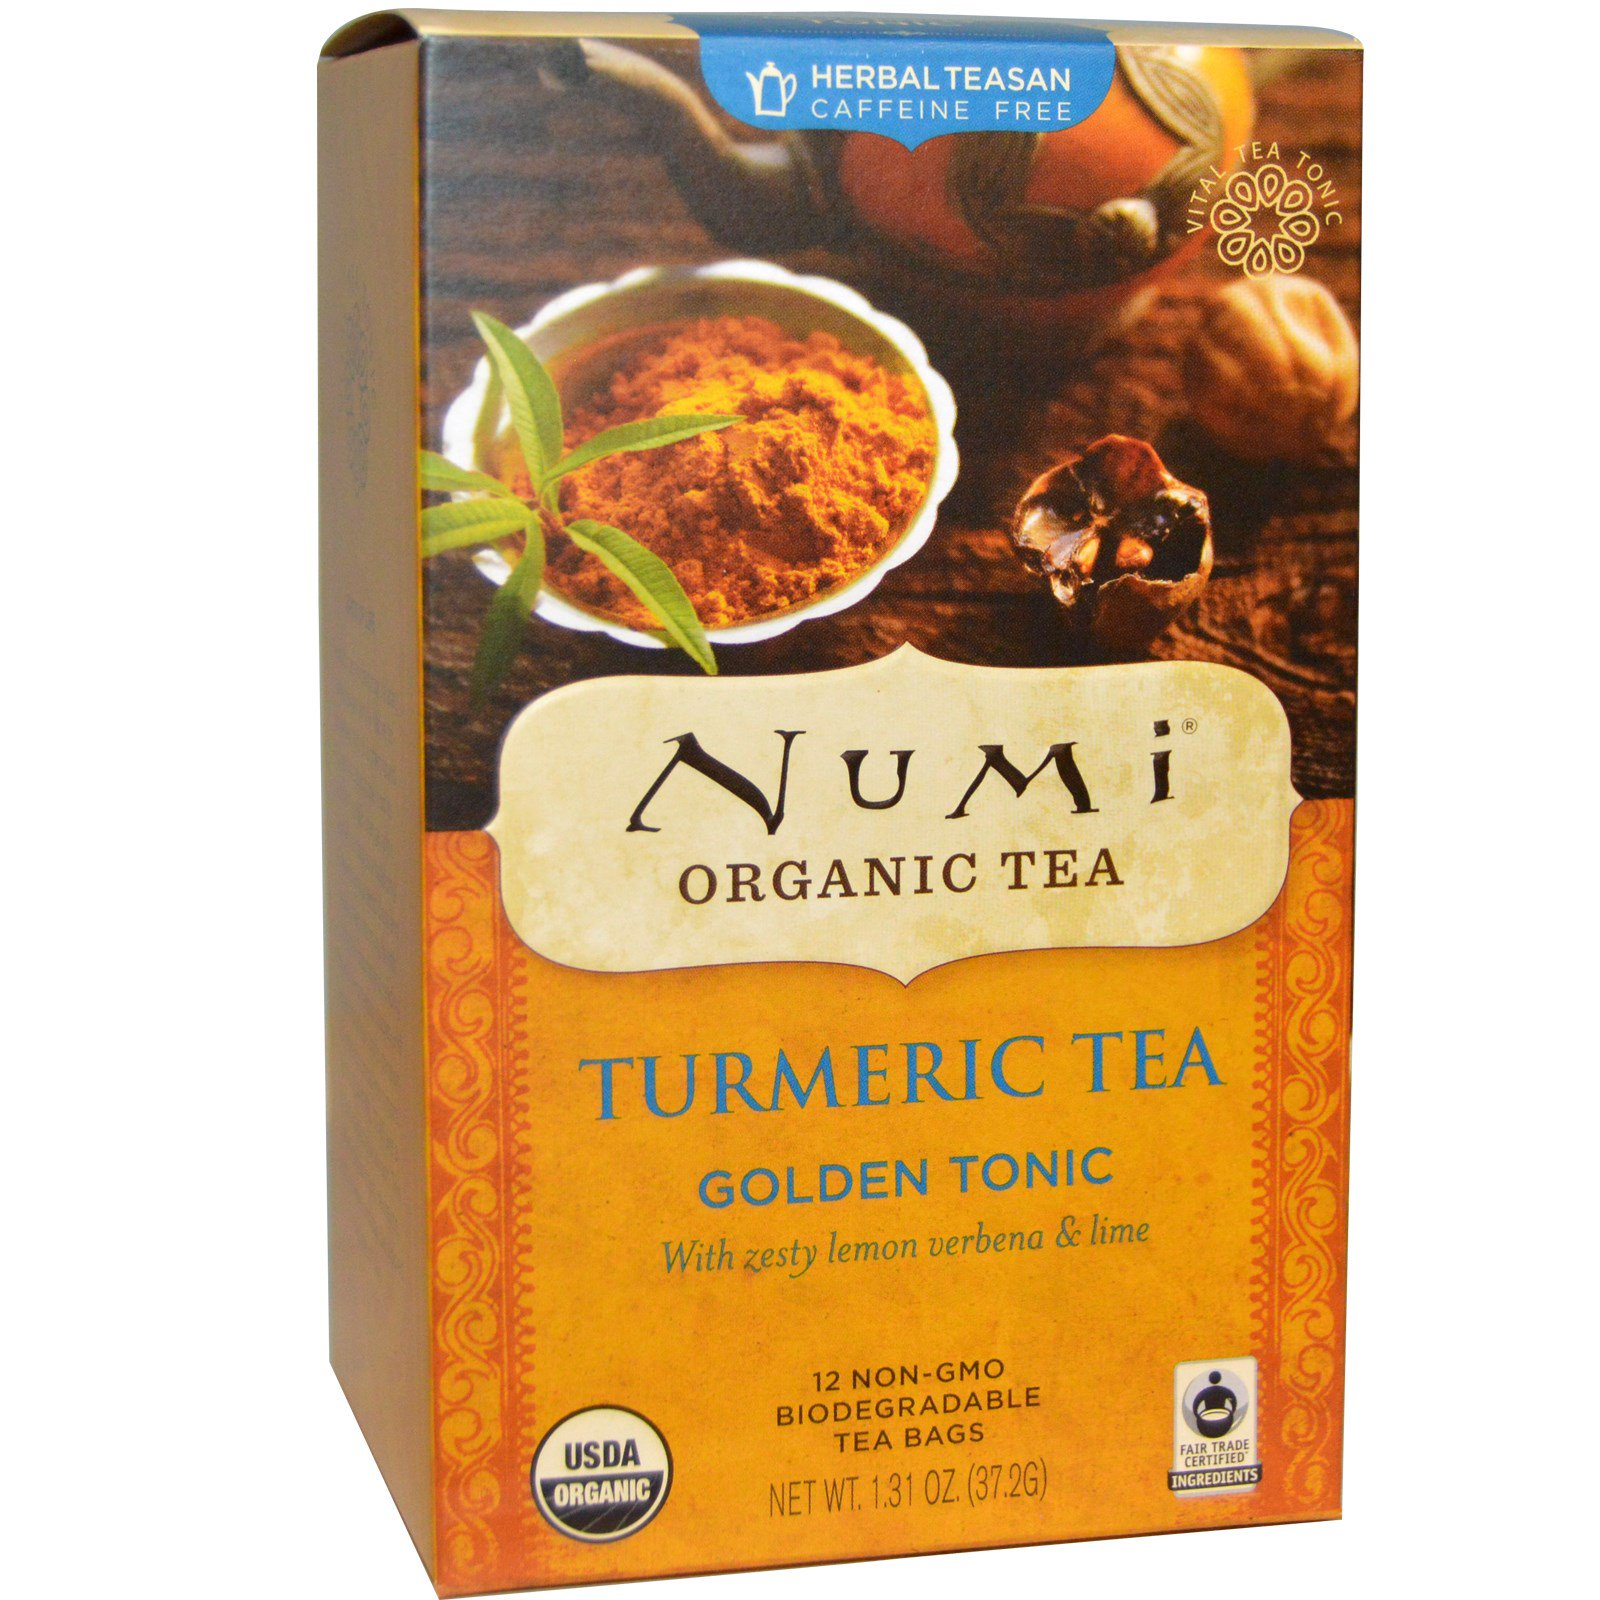 Numi Tea, OrganicTurmeric Tea, Golden Tonic with Zesty Lemon Verbena & Lime, 12 Tea Bags, 1.31 oz (37.2 g) Each